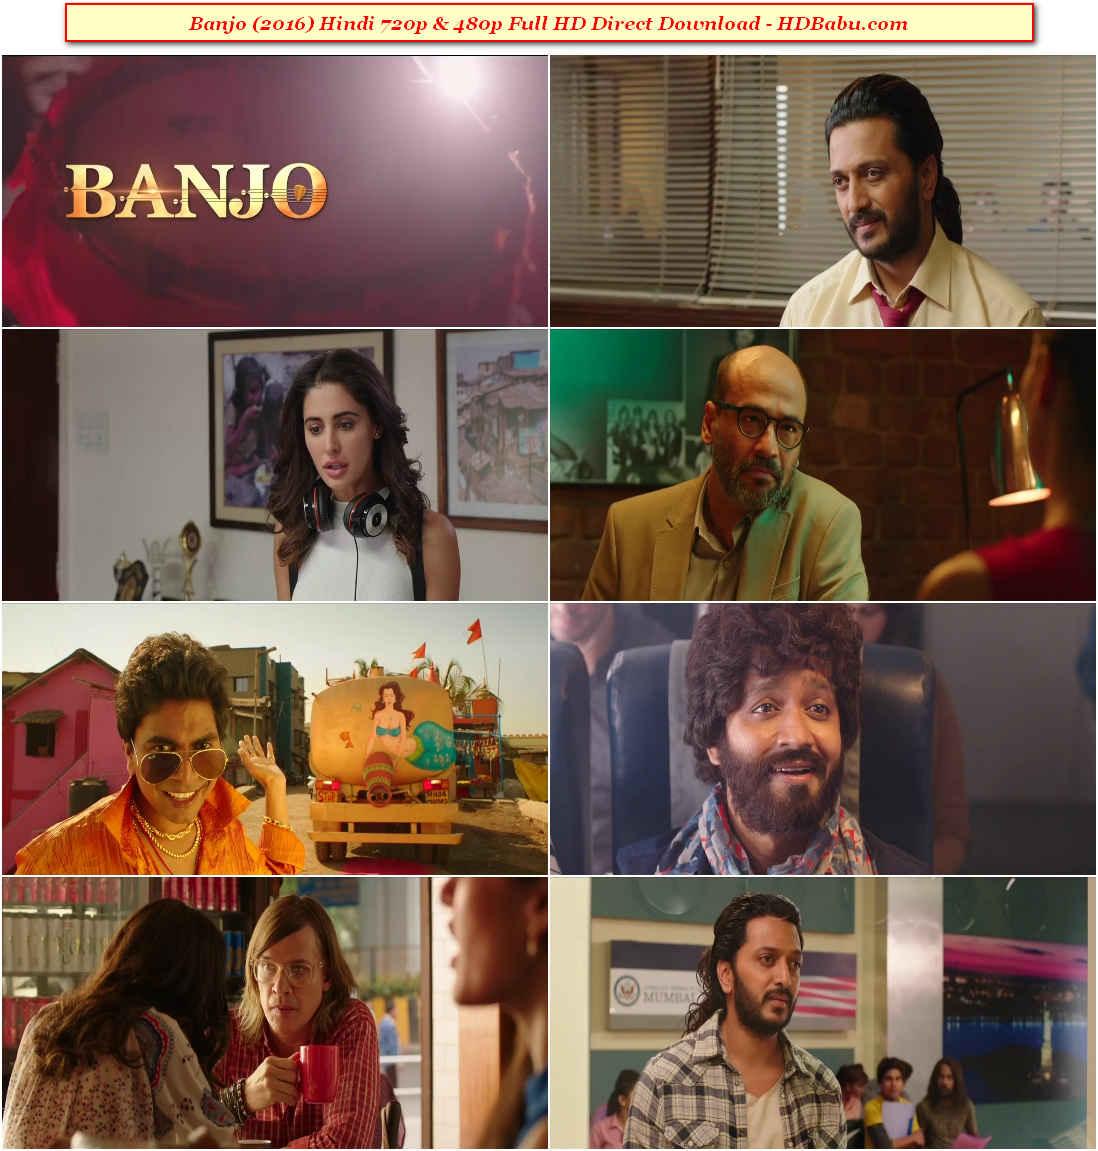 Pyaar Ka Punchnama 2 Full Movie Download